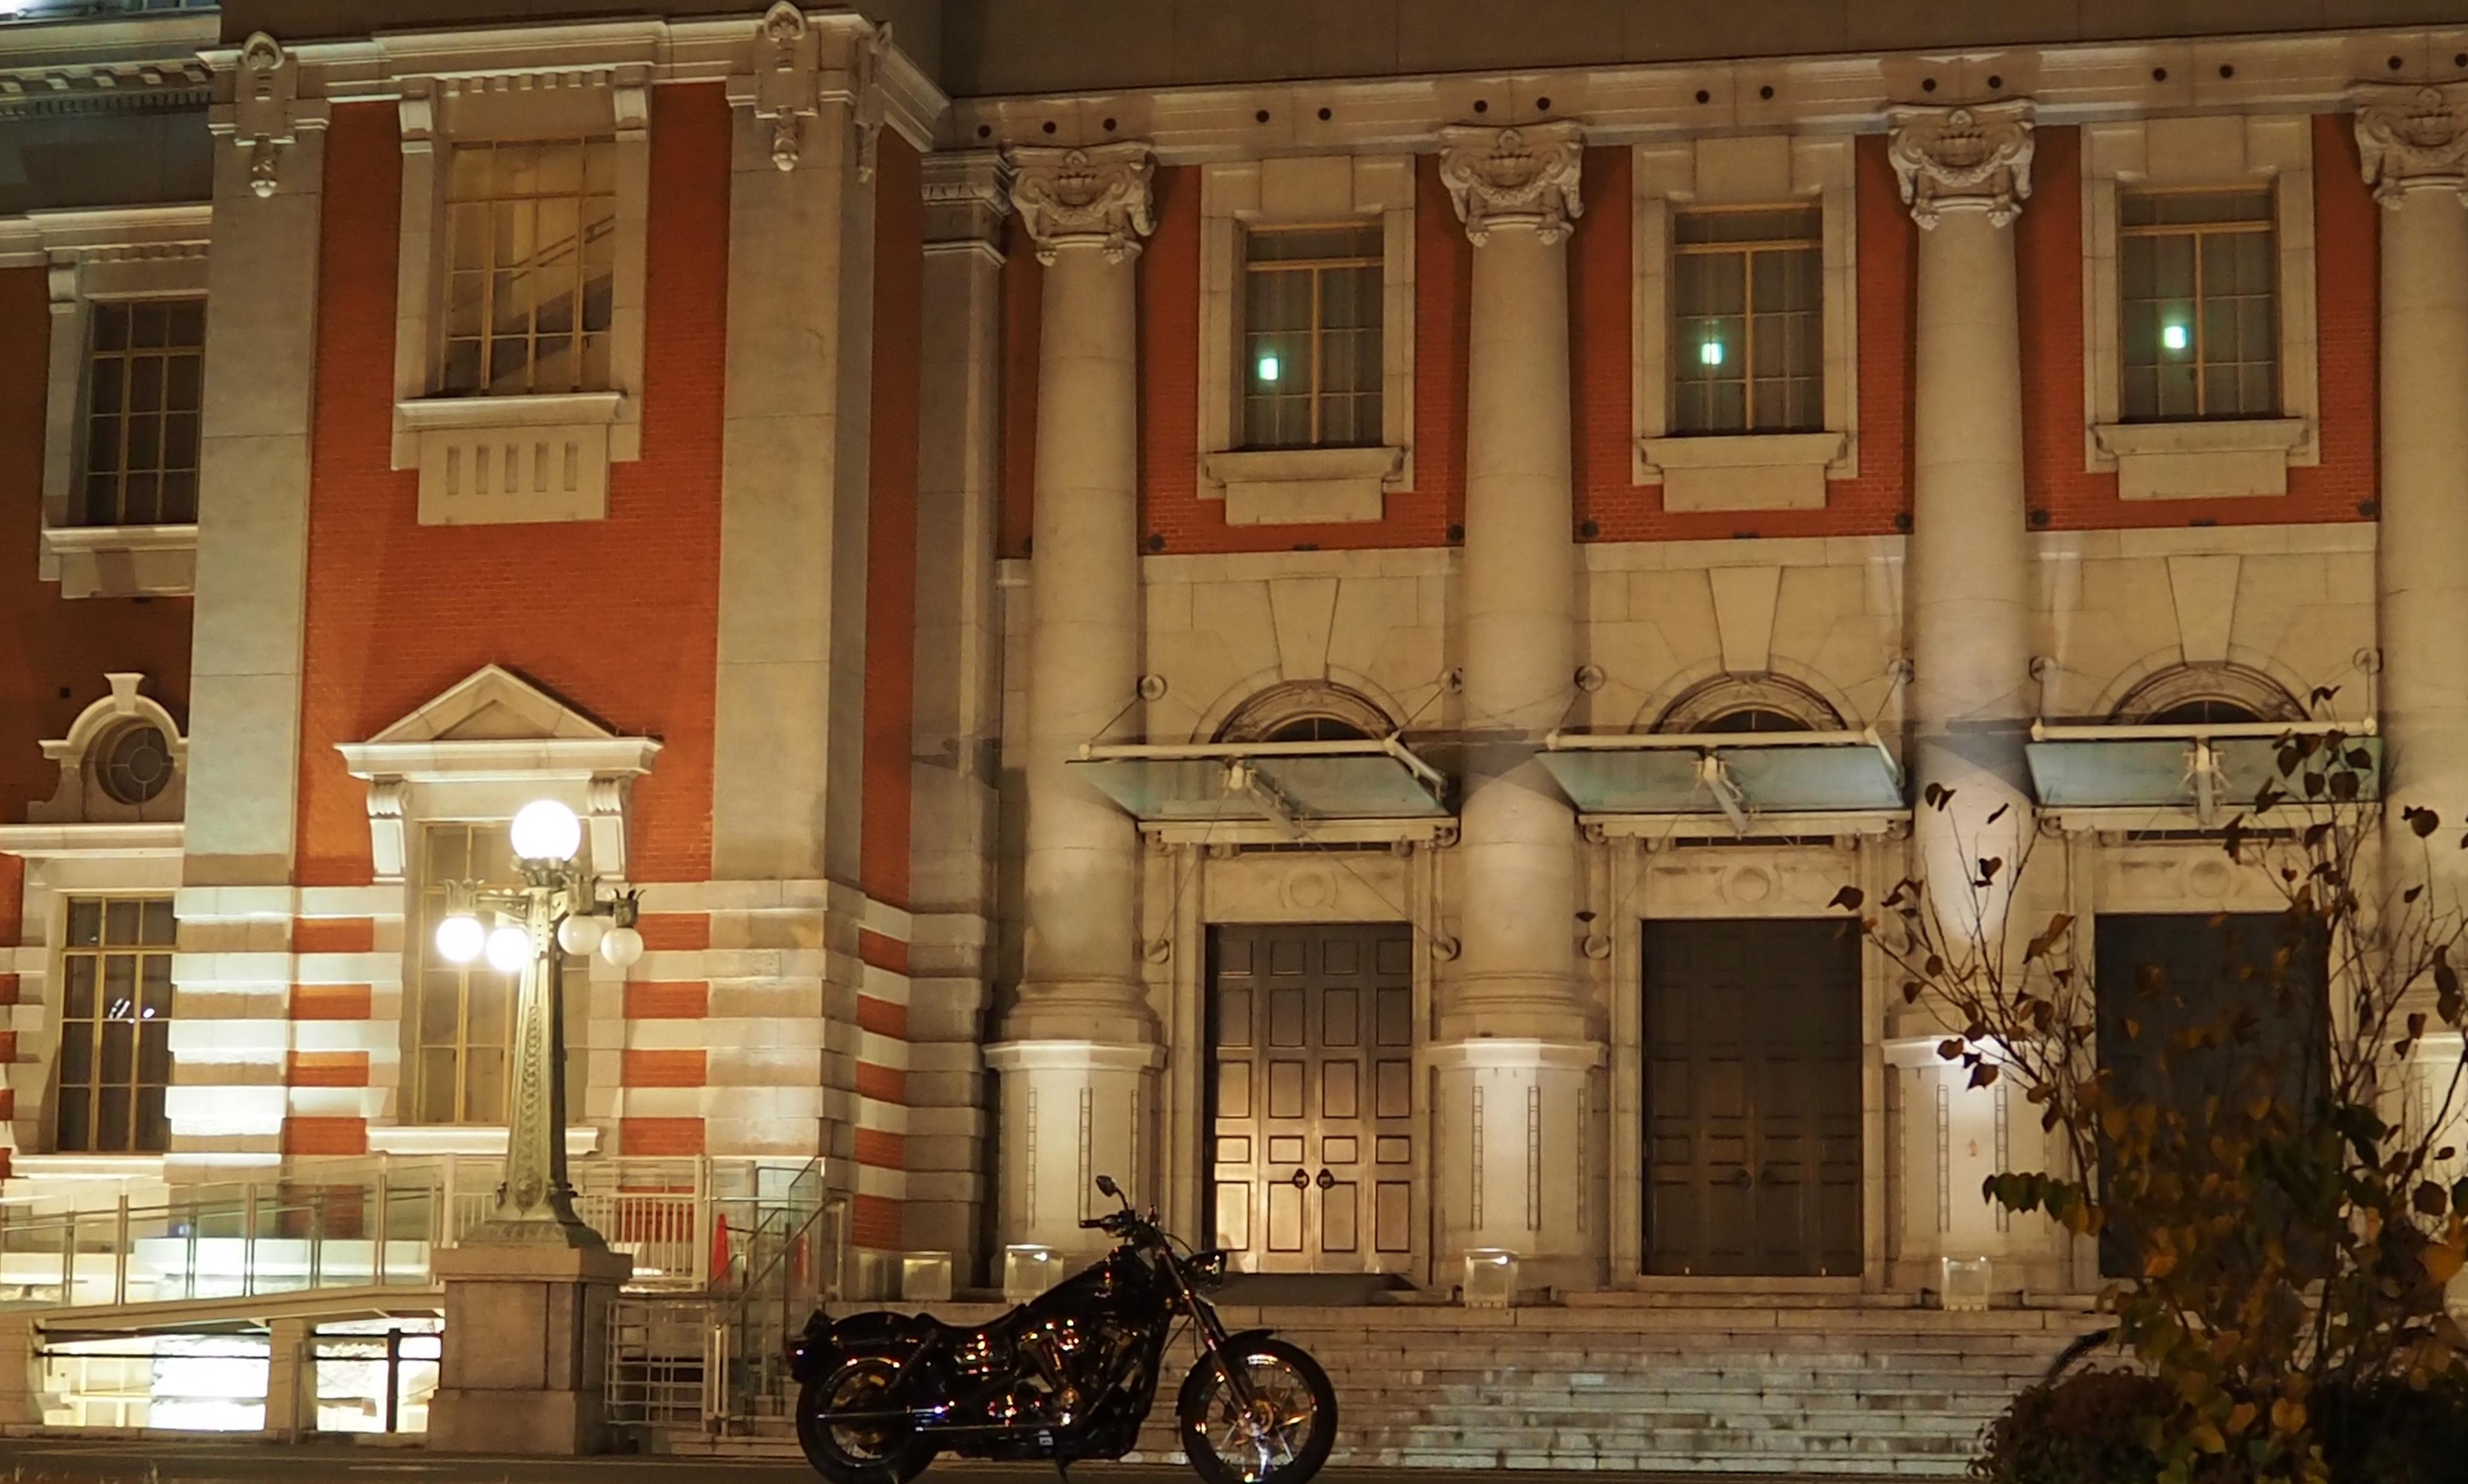 harleydavidson-motorcycle-touring-blog-osaka-nightouring-osakacitycentralpublichall-2.jpg